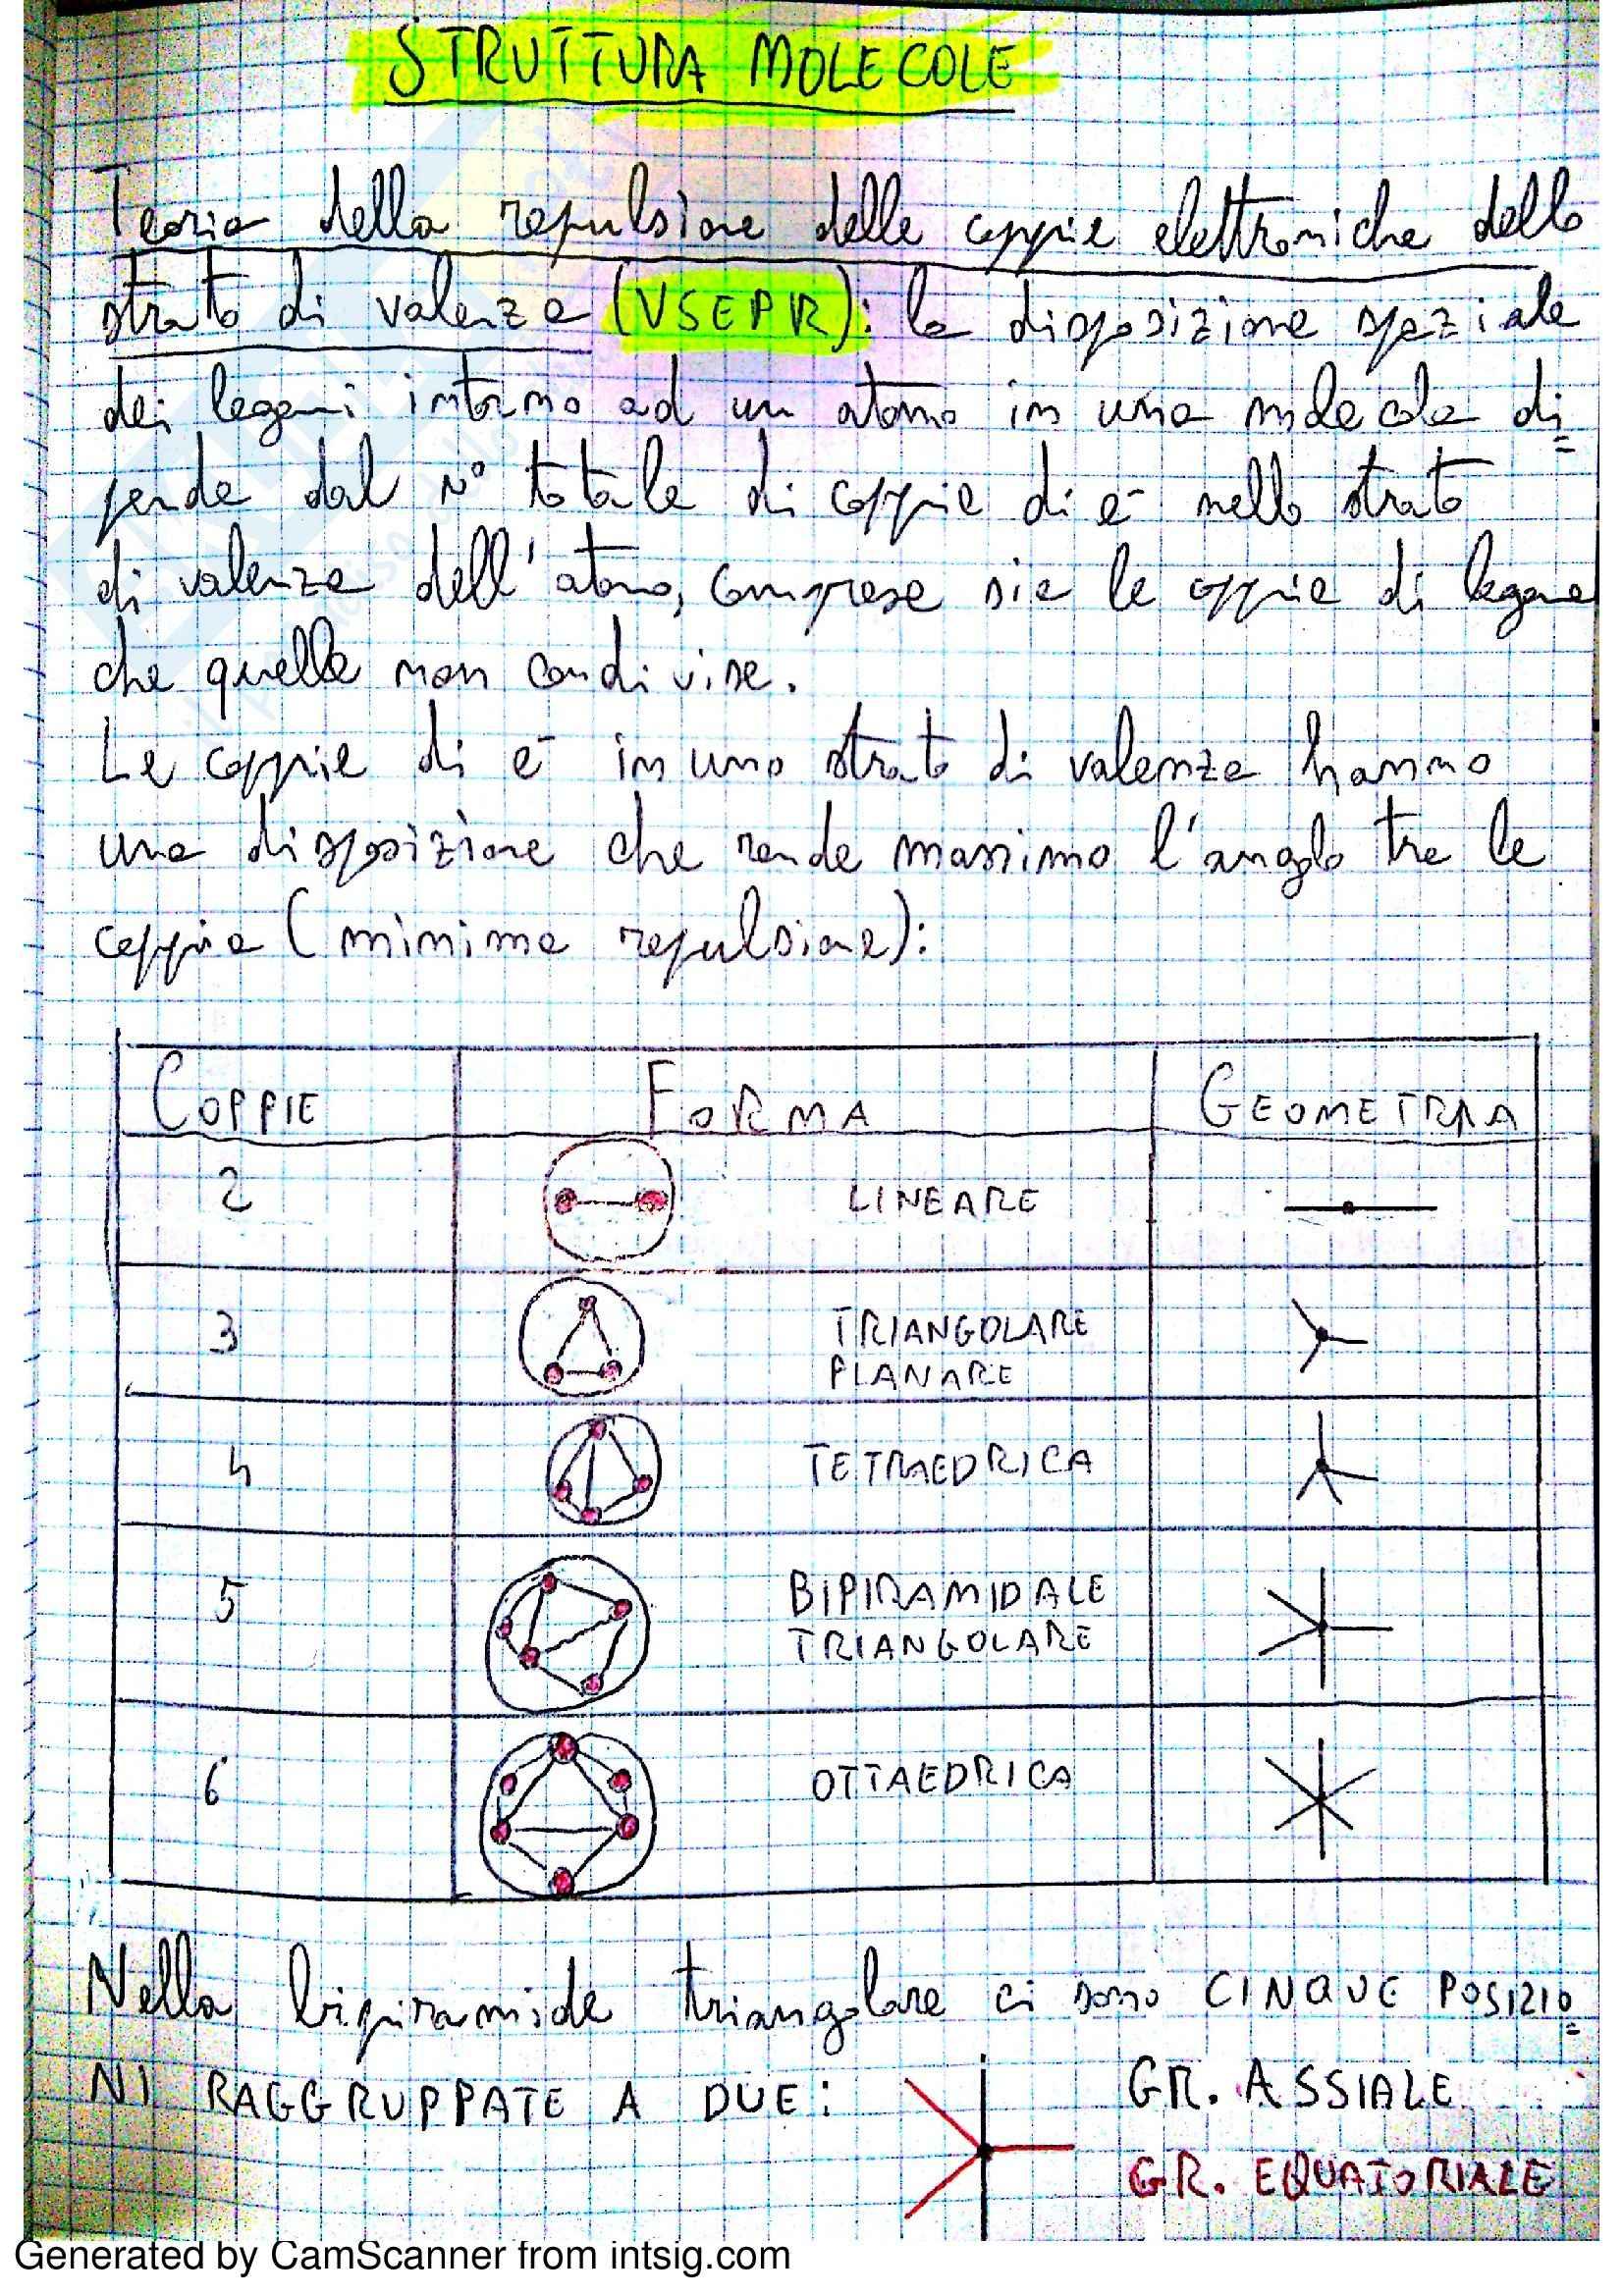 Chimica generale  e inorganica - Teoria VSEPR